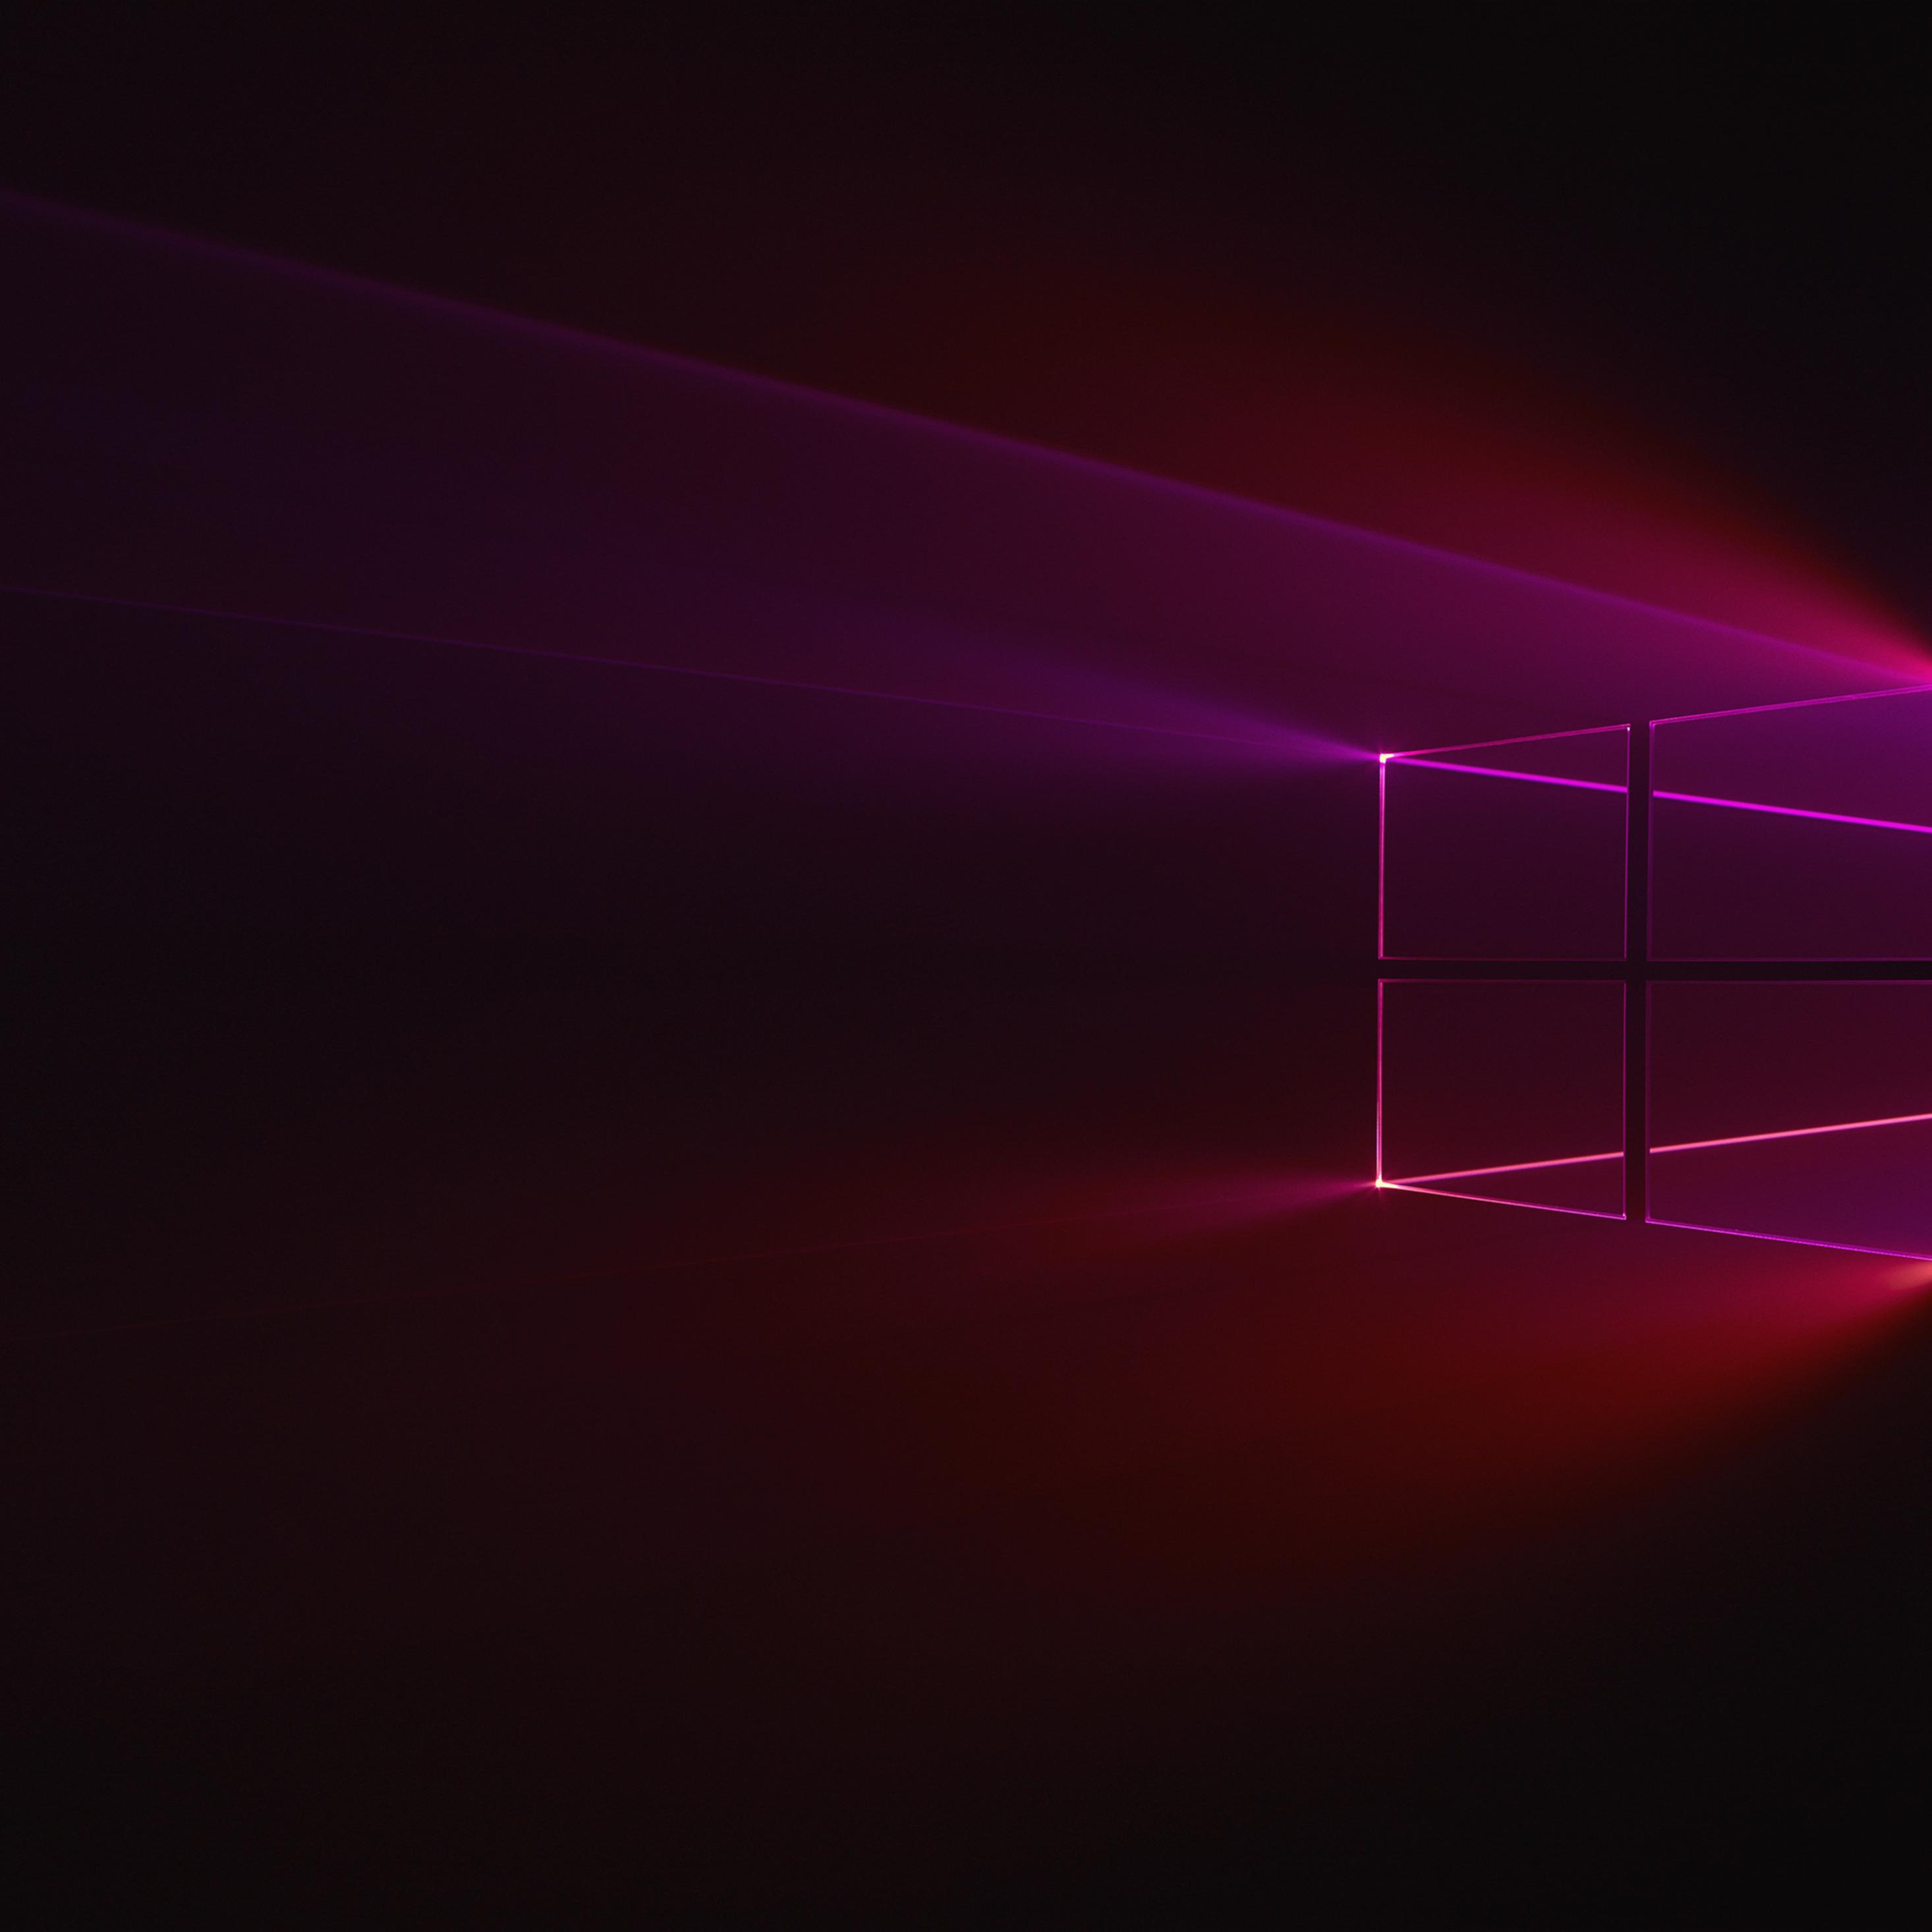 2932x2932 Windows 10 Glass Background Ipad Pro Retina